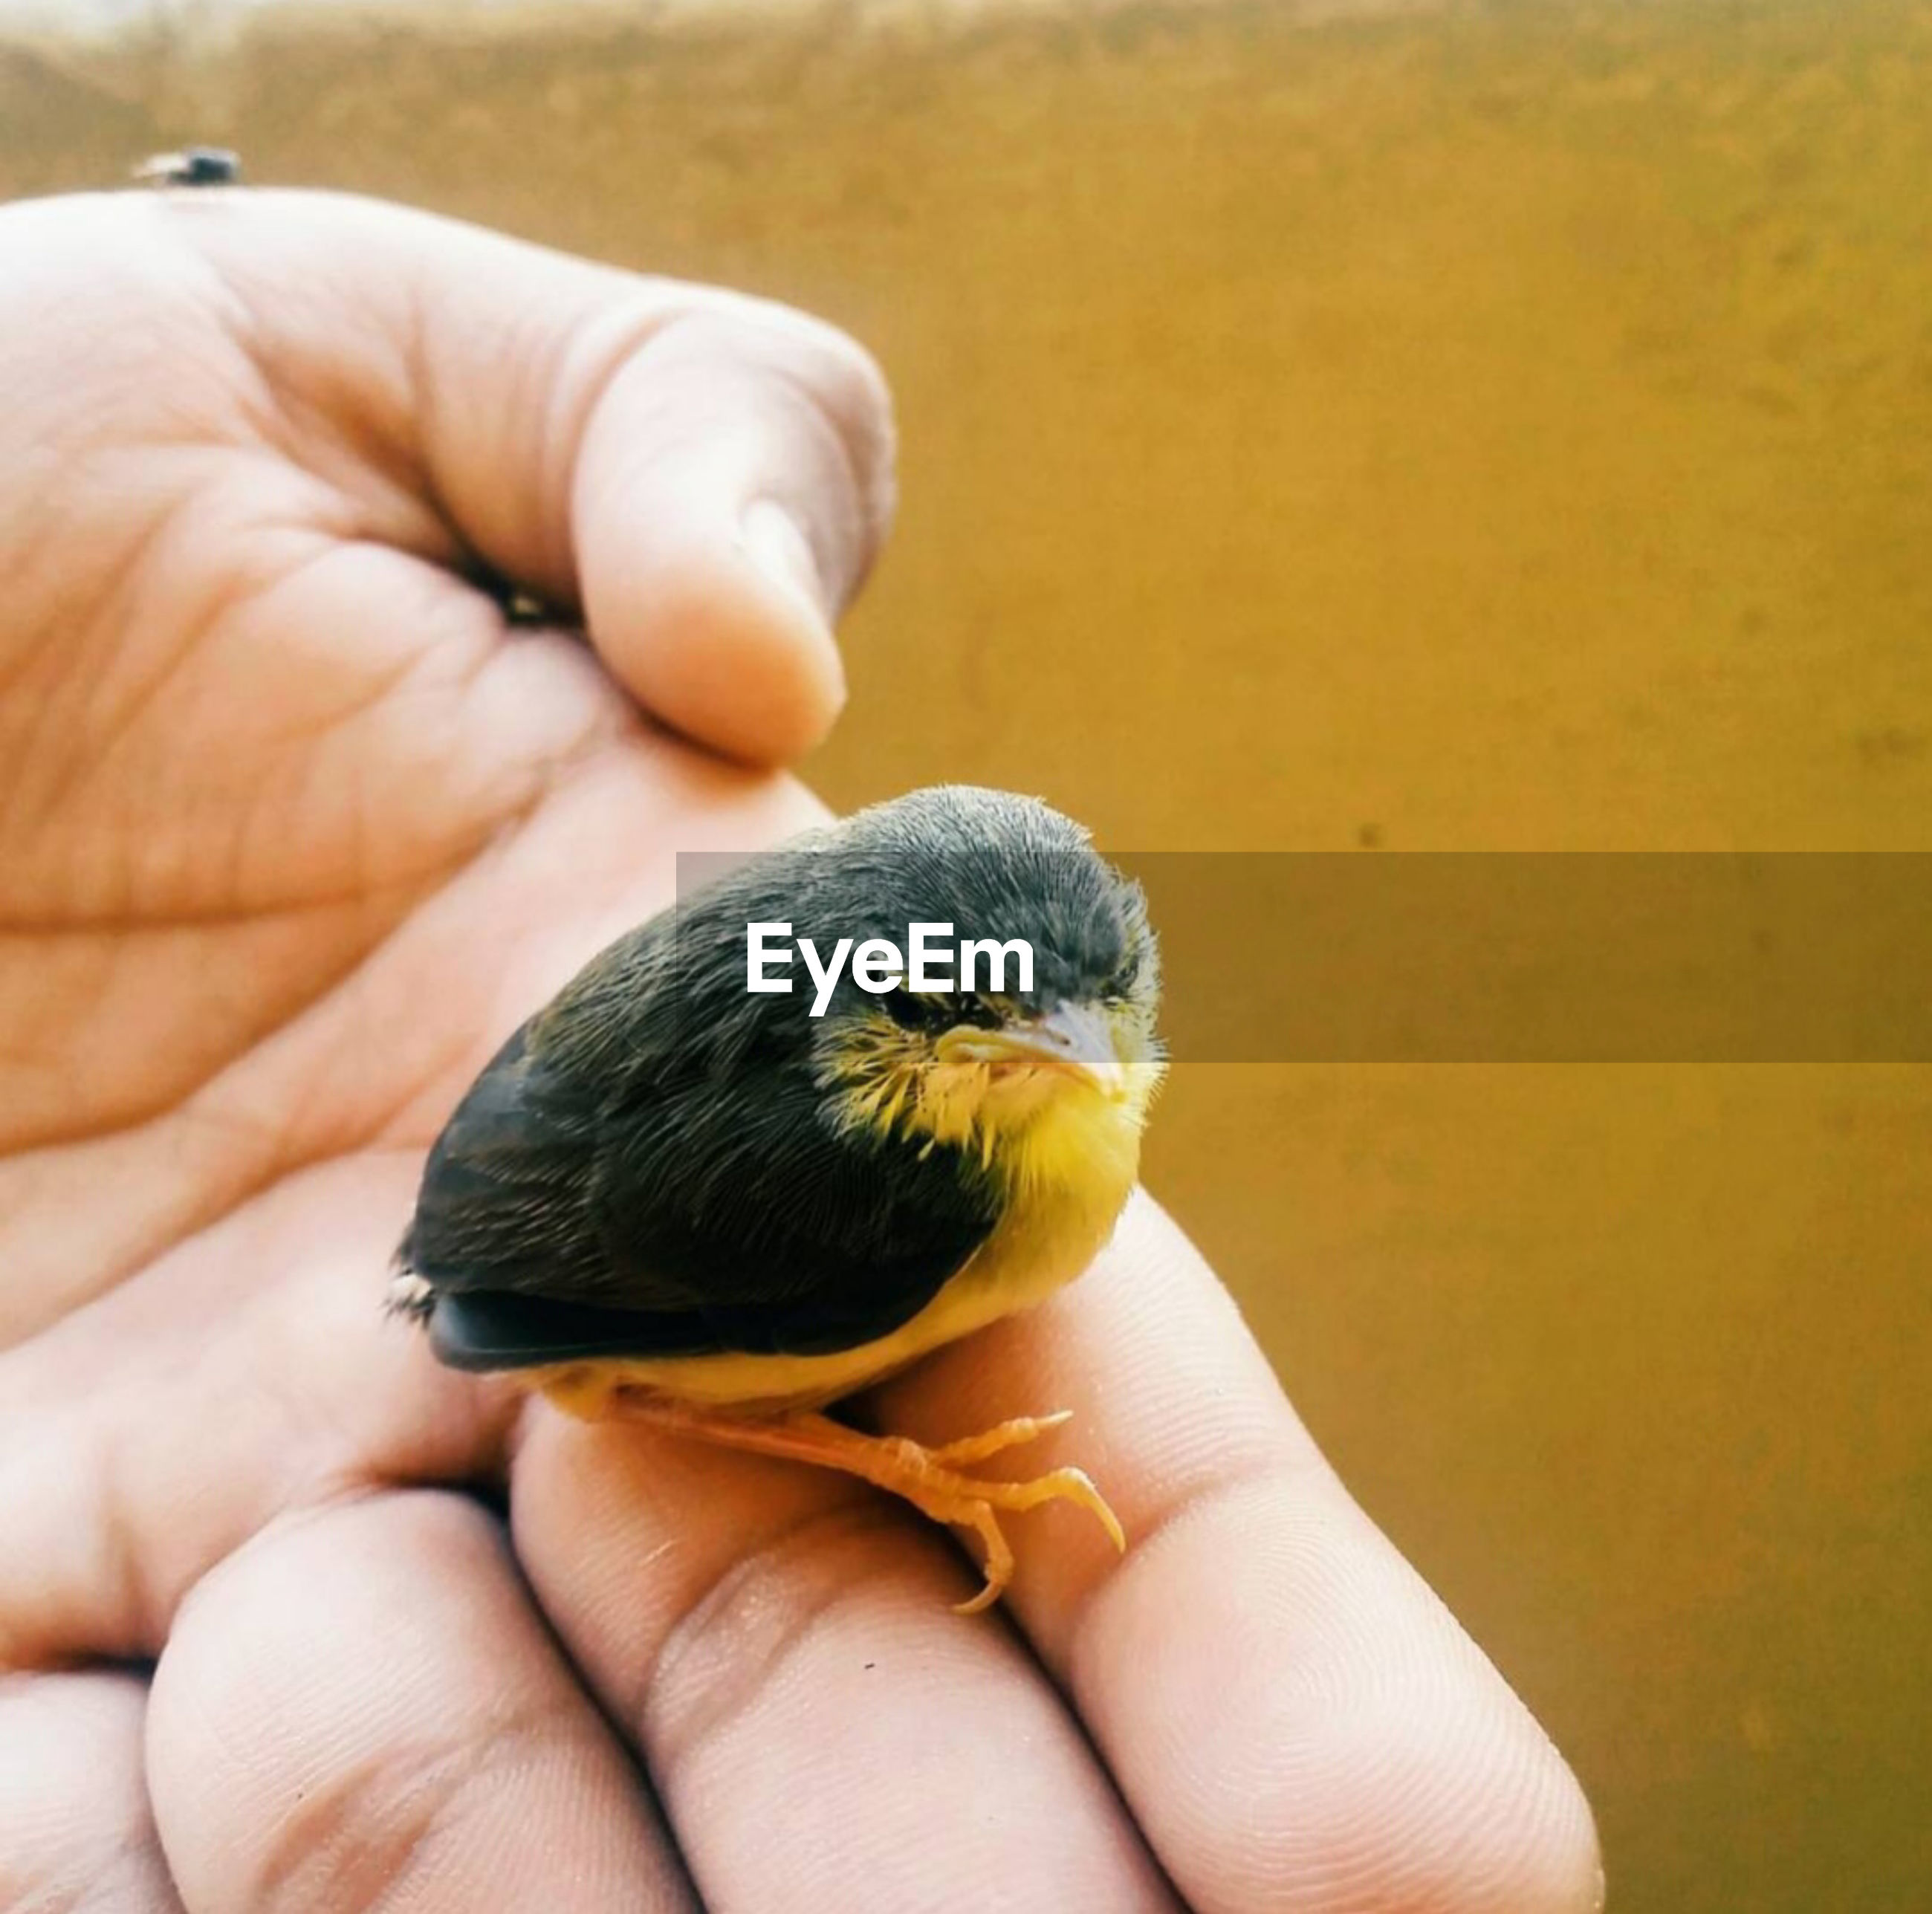 Close-up of hand holding small bird